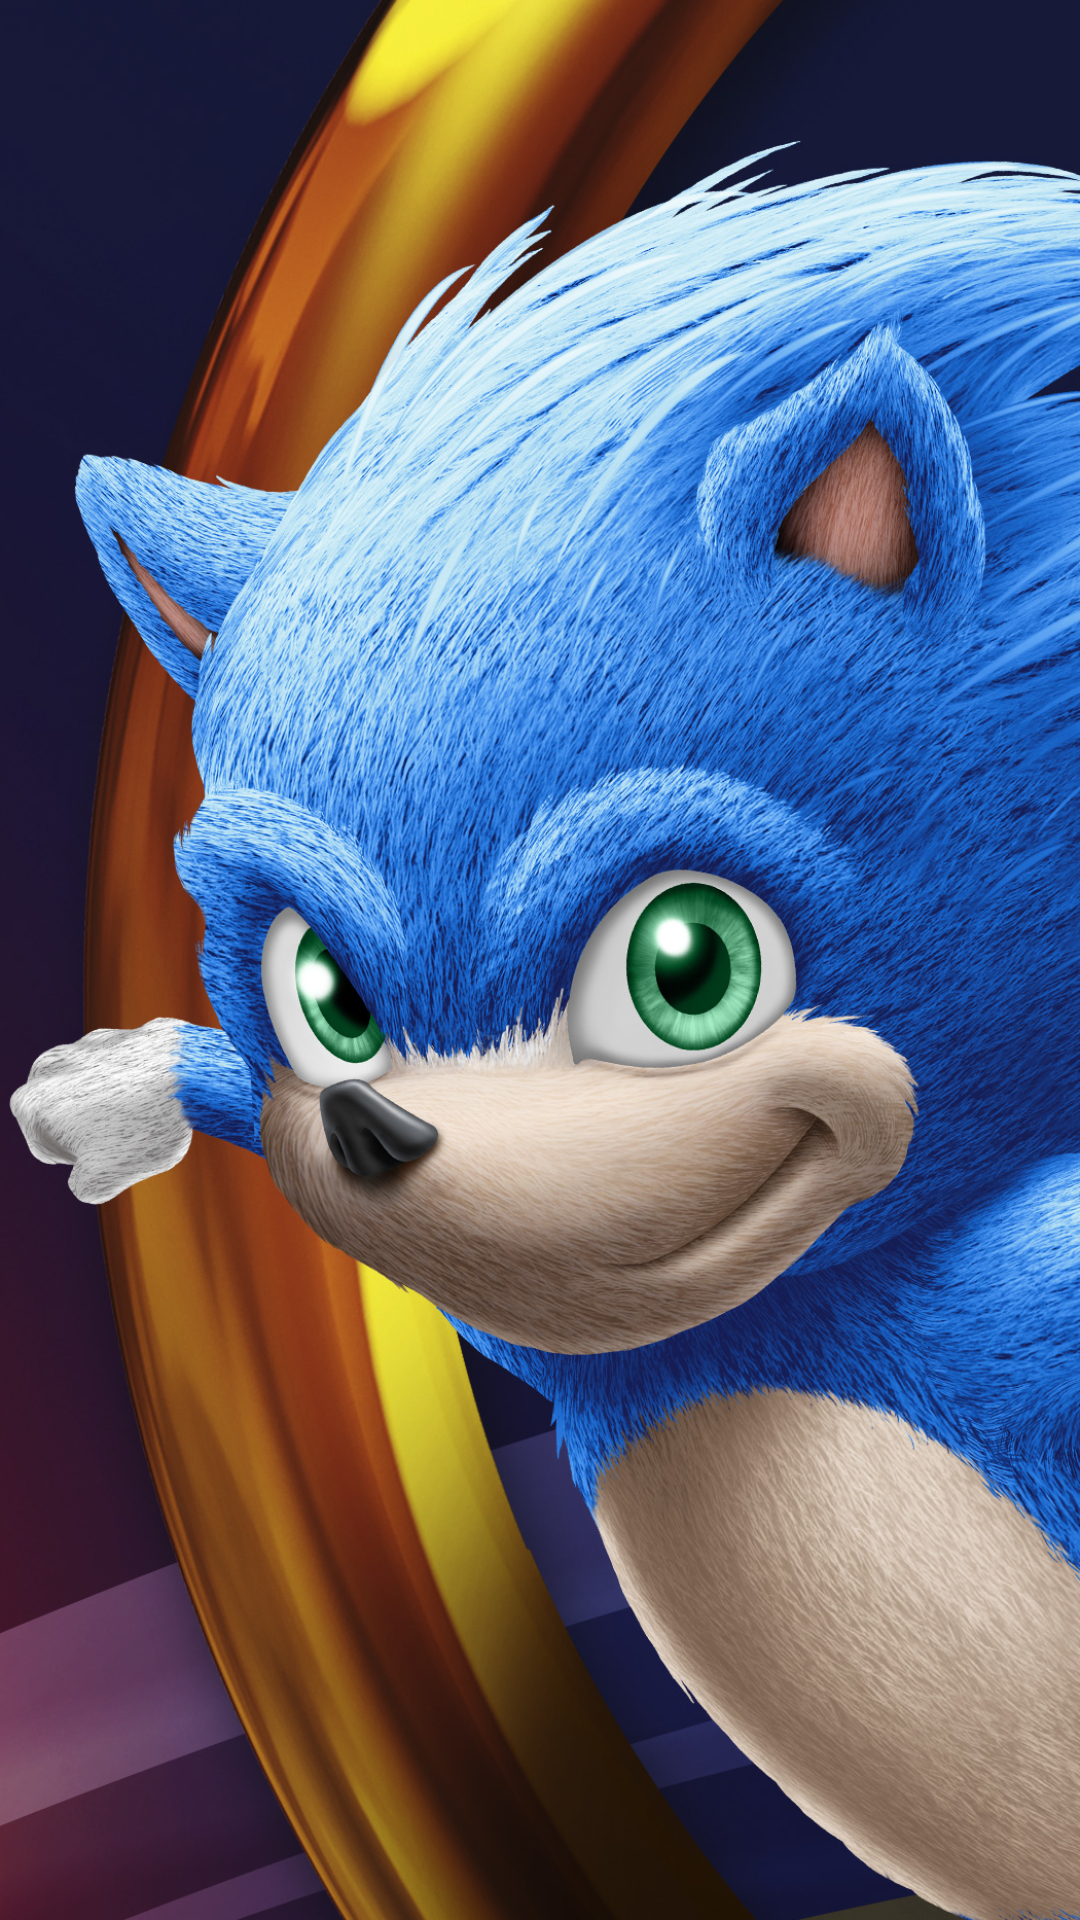 MovieSonic The Hedgehog 2020 1080x1920 Wallpaper ID 775917 1080x1920